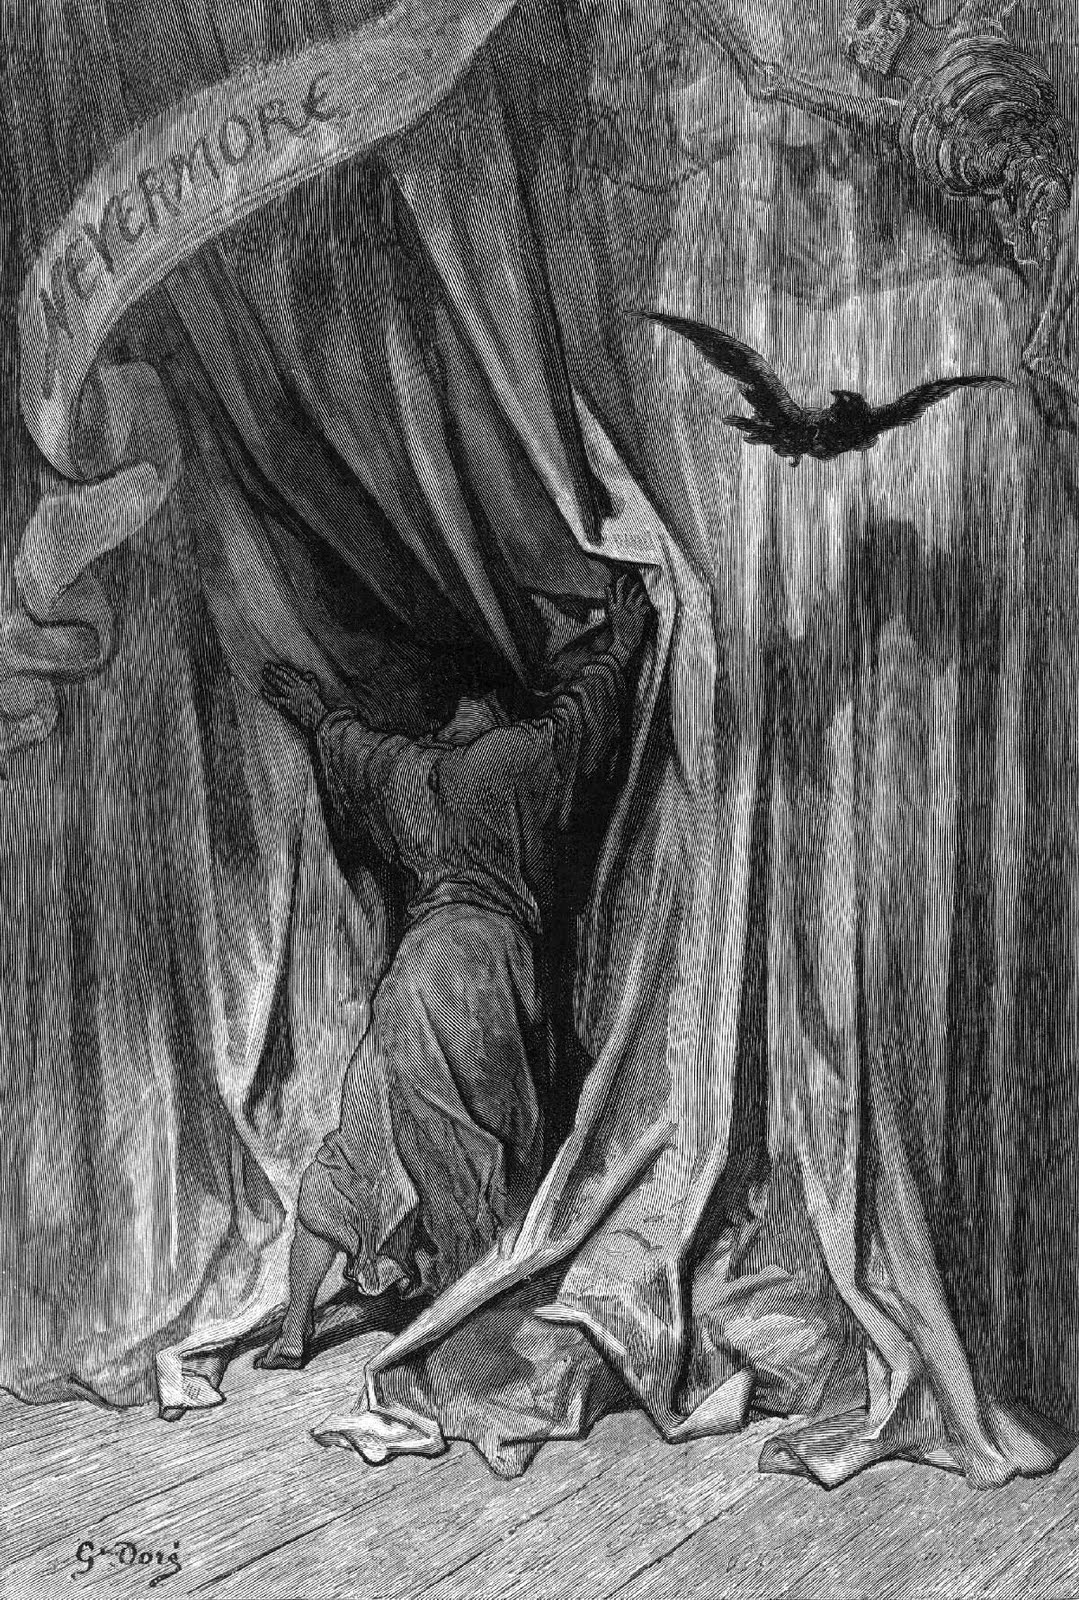 http://lacasavictoriana.files.wordpress.com/2011/10/dore_the_raven_1884-01.jpg